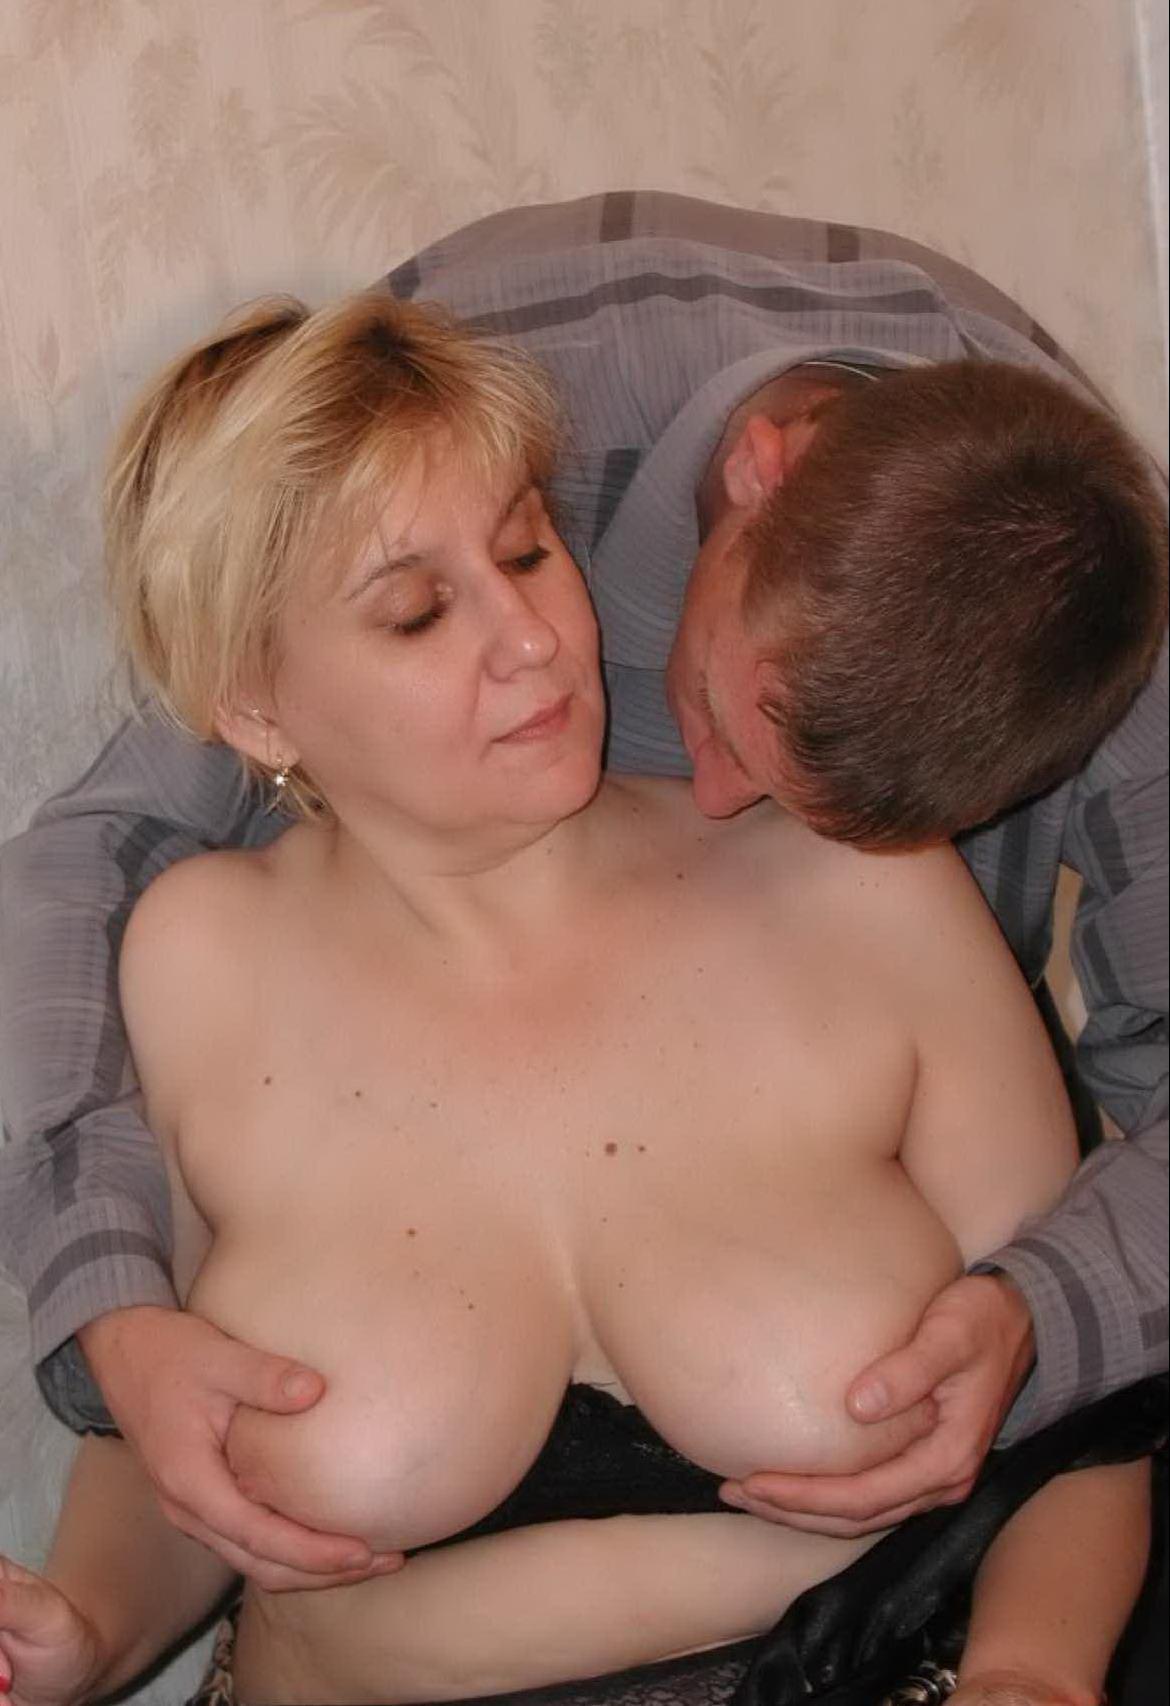 Кончил В Маму Порно Онлайн